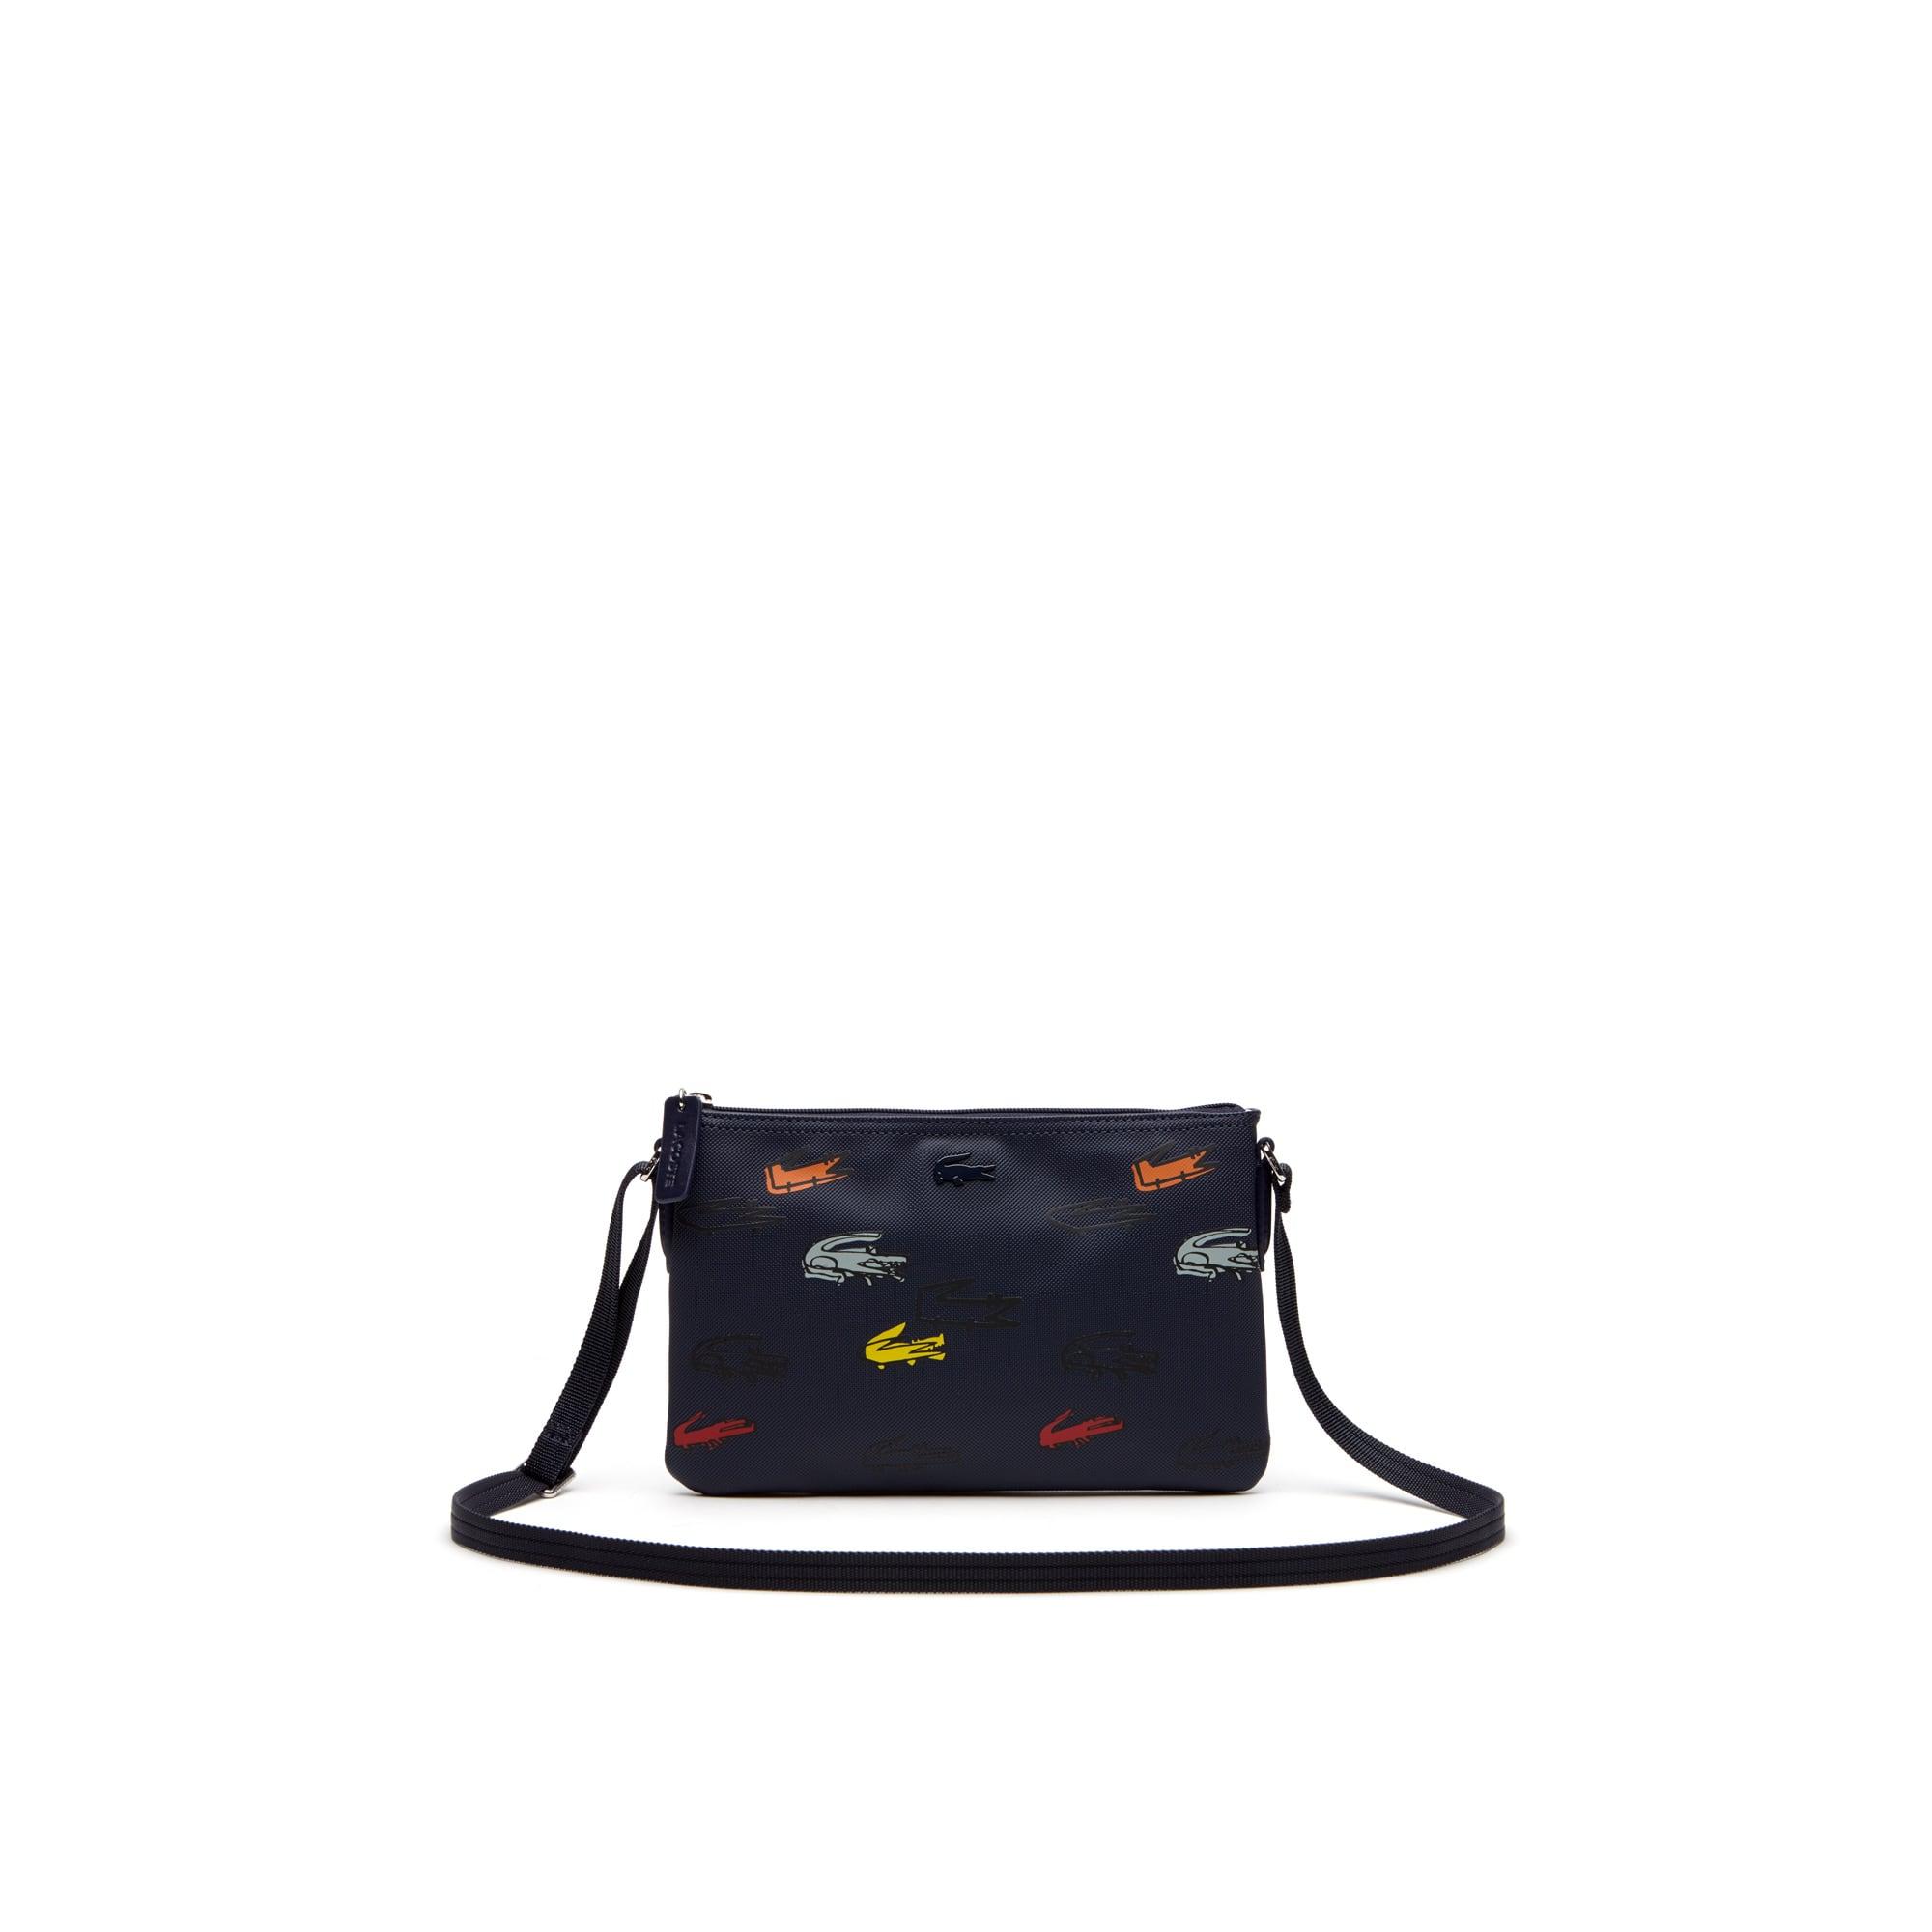 Women's L.12.12 Concept Croc Print Zip Crossover Bag